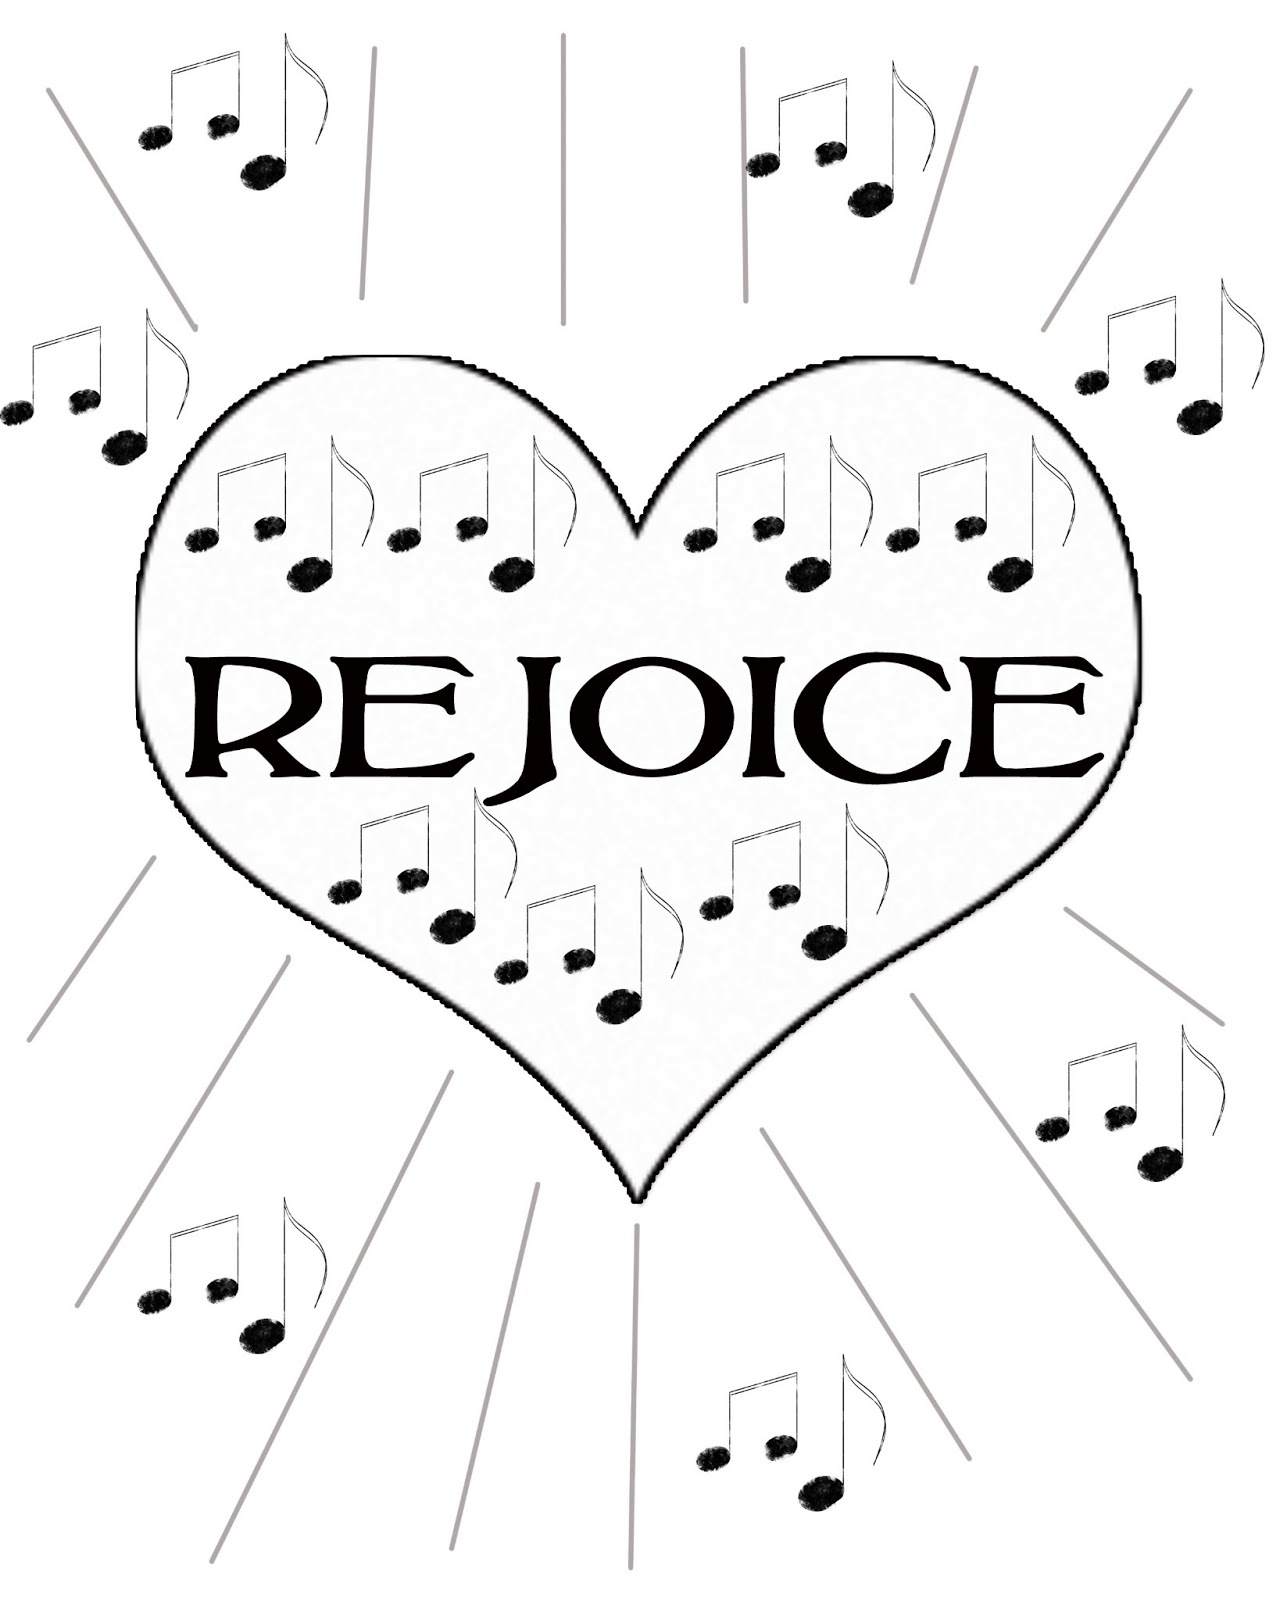 rejoice coloring pages - photo#6